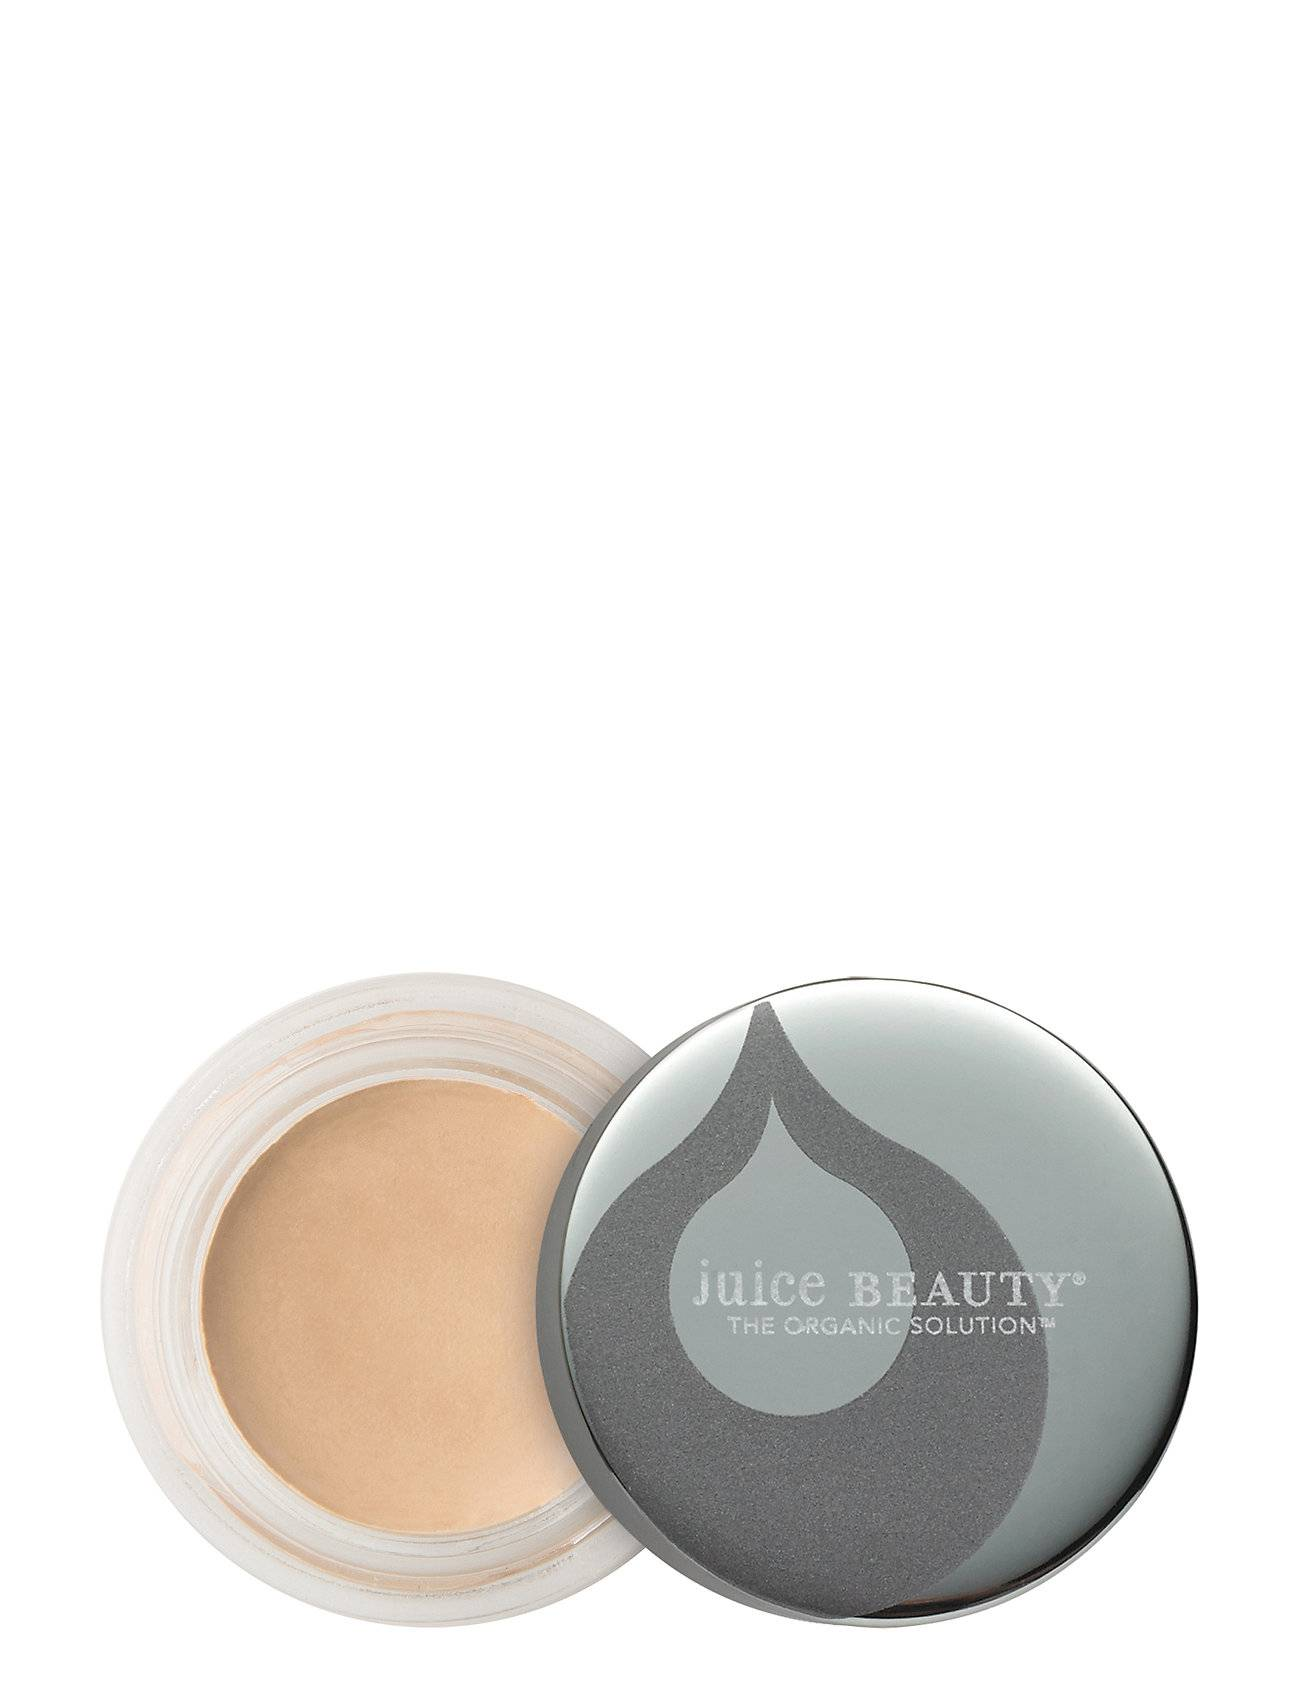 Juice Beauty Perfecting Concealer - 08 Cream